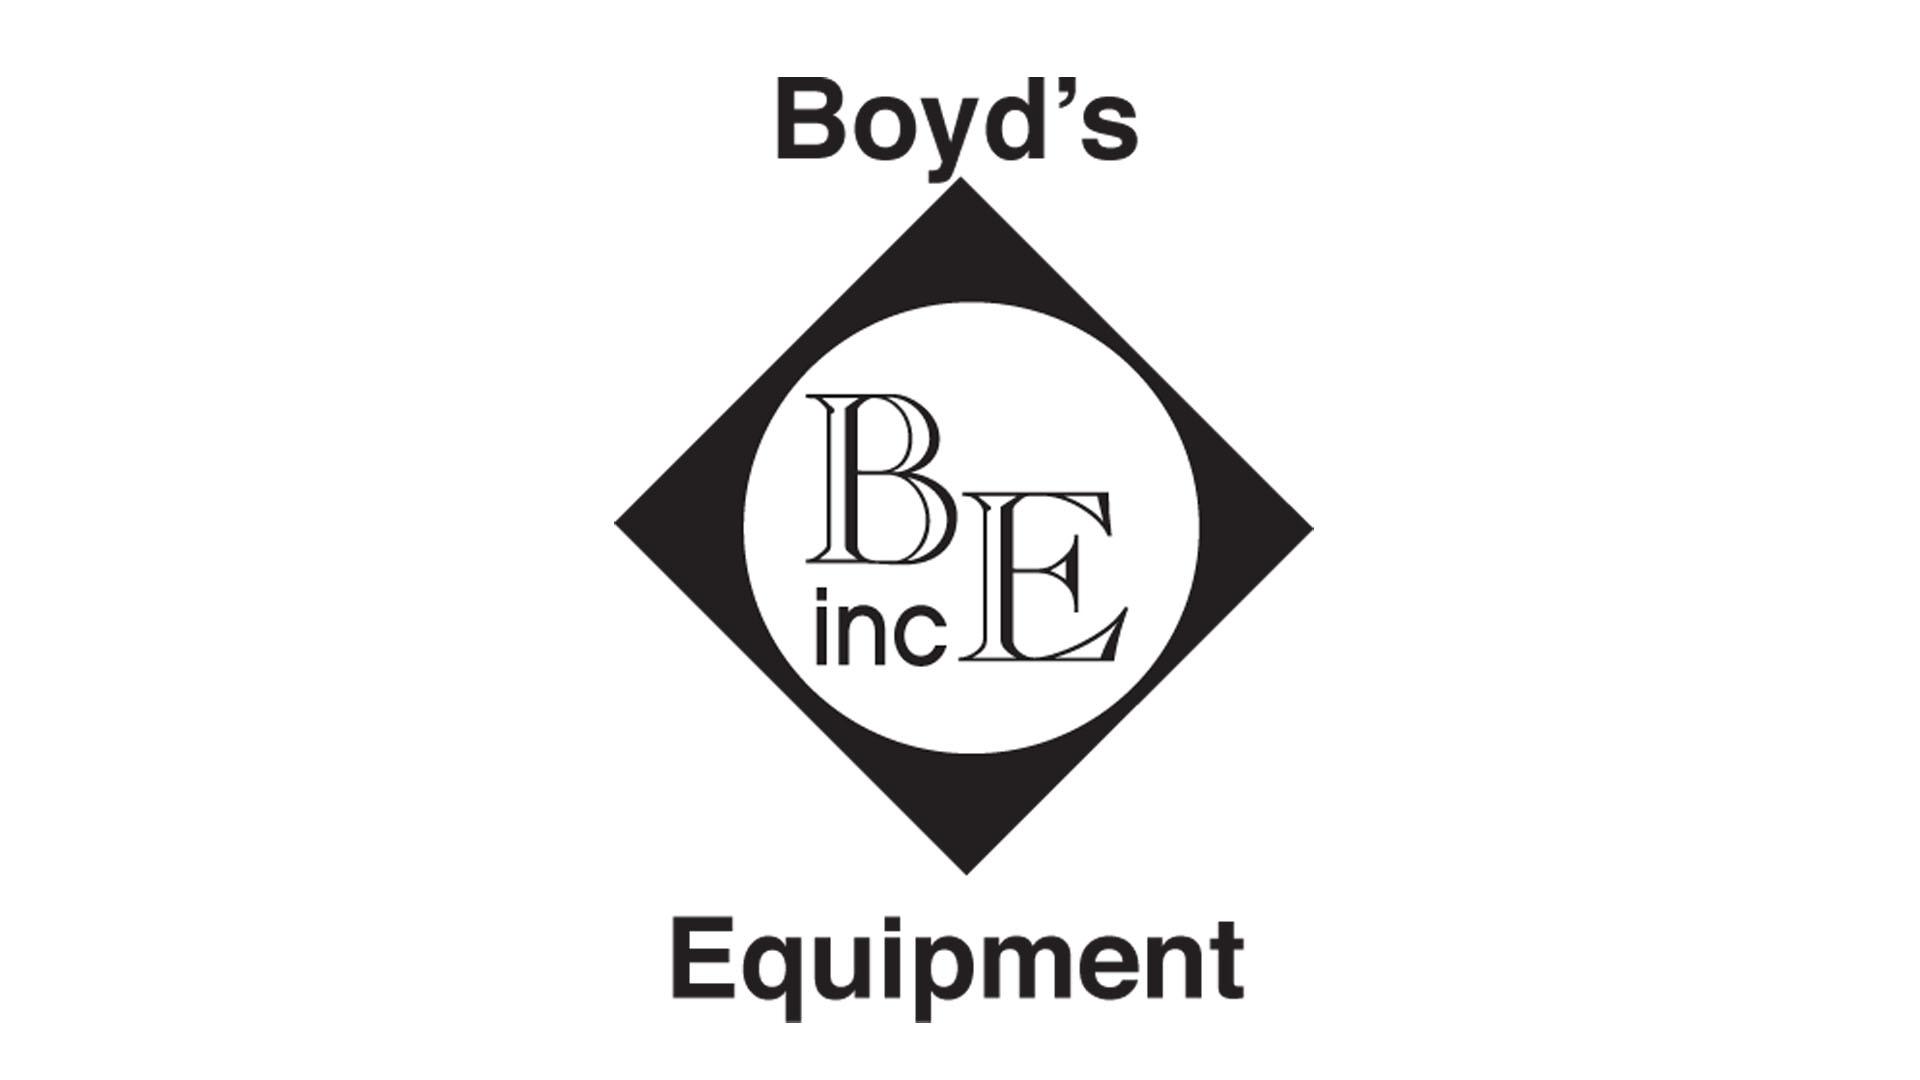 Boyd's Equipment